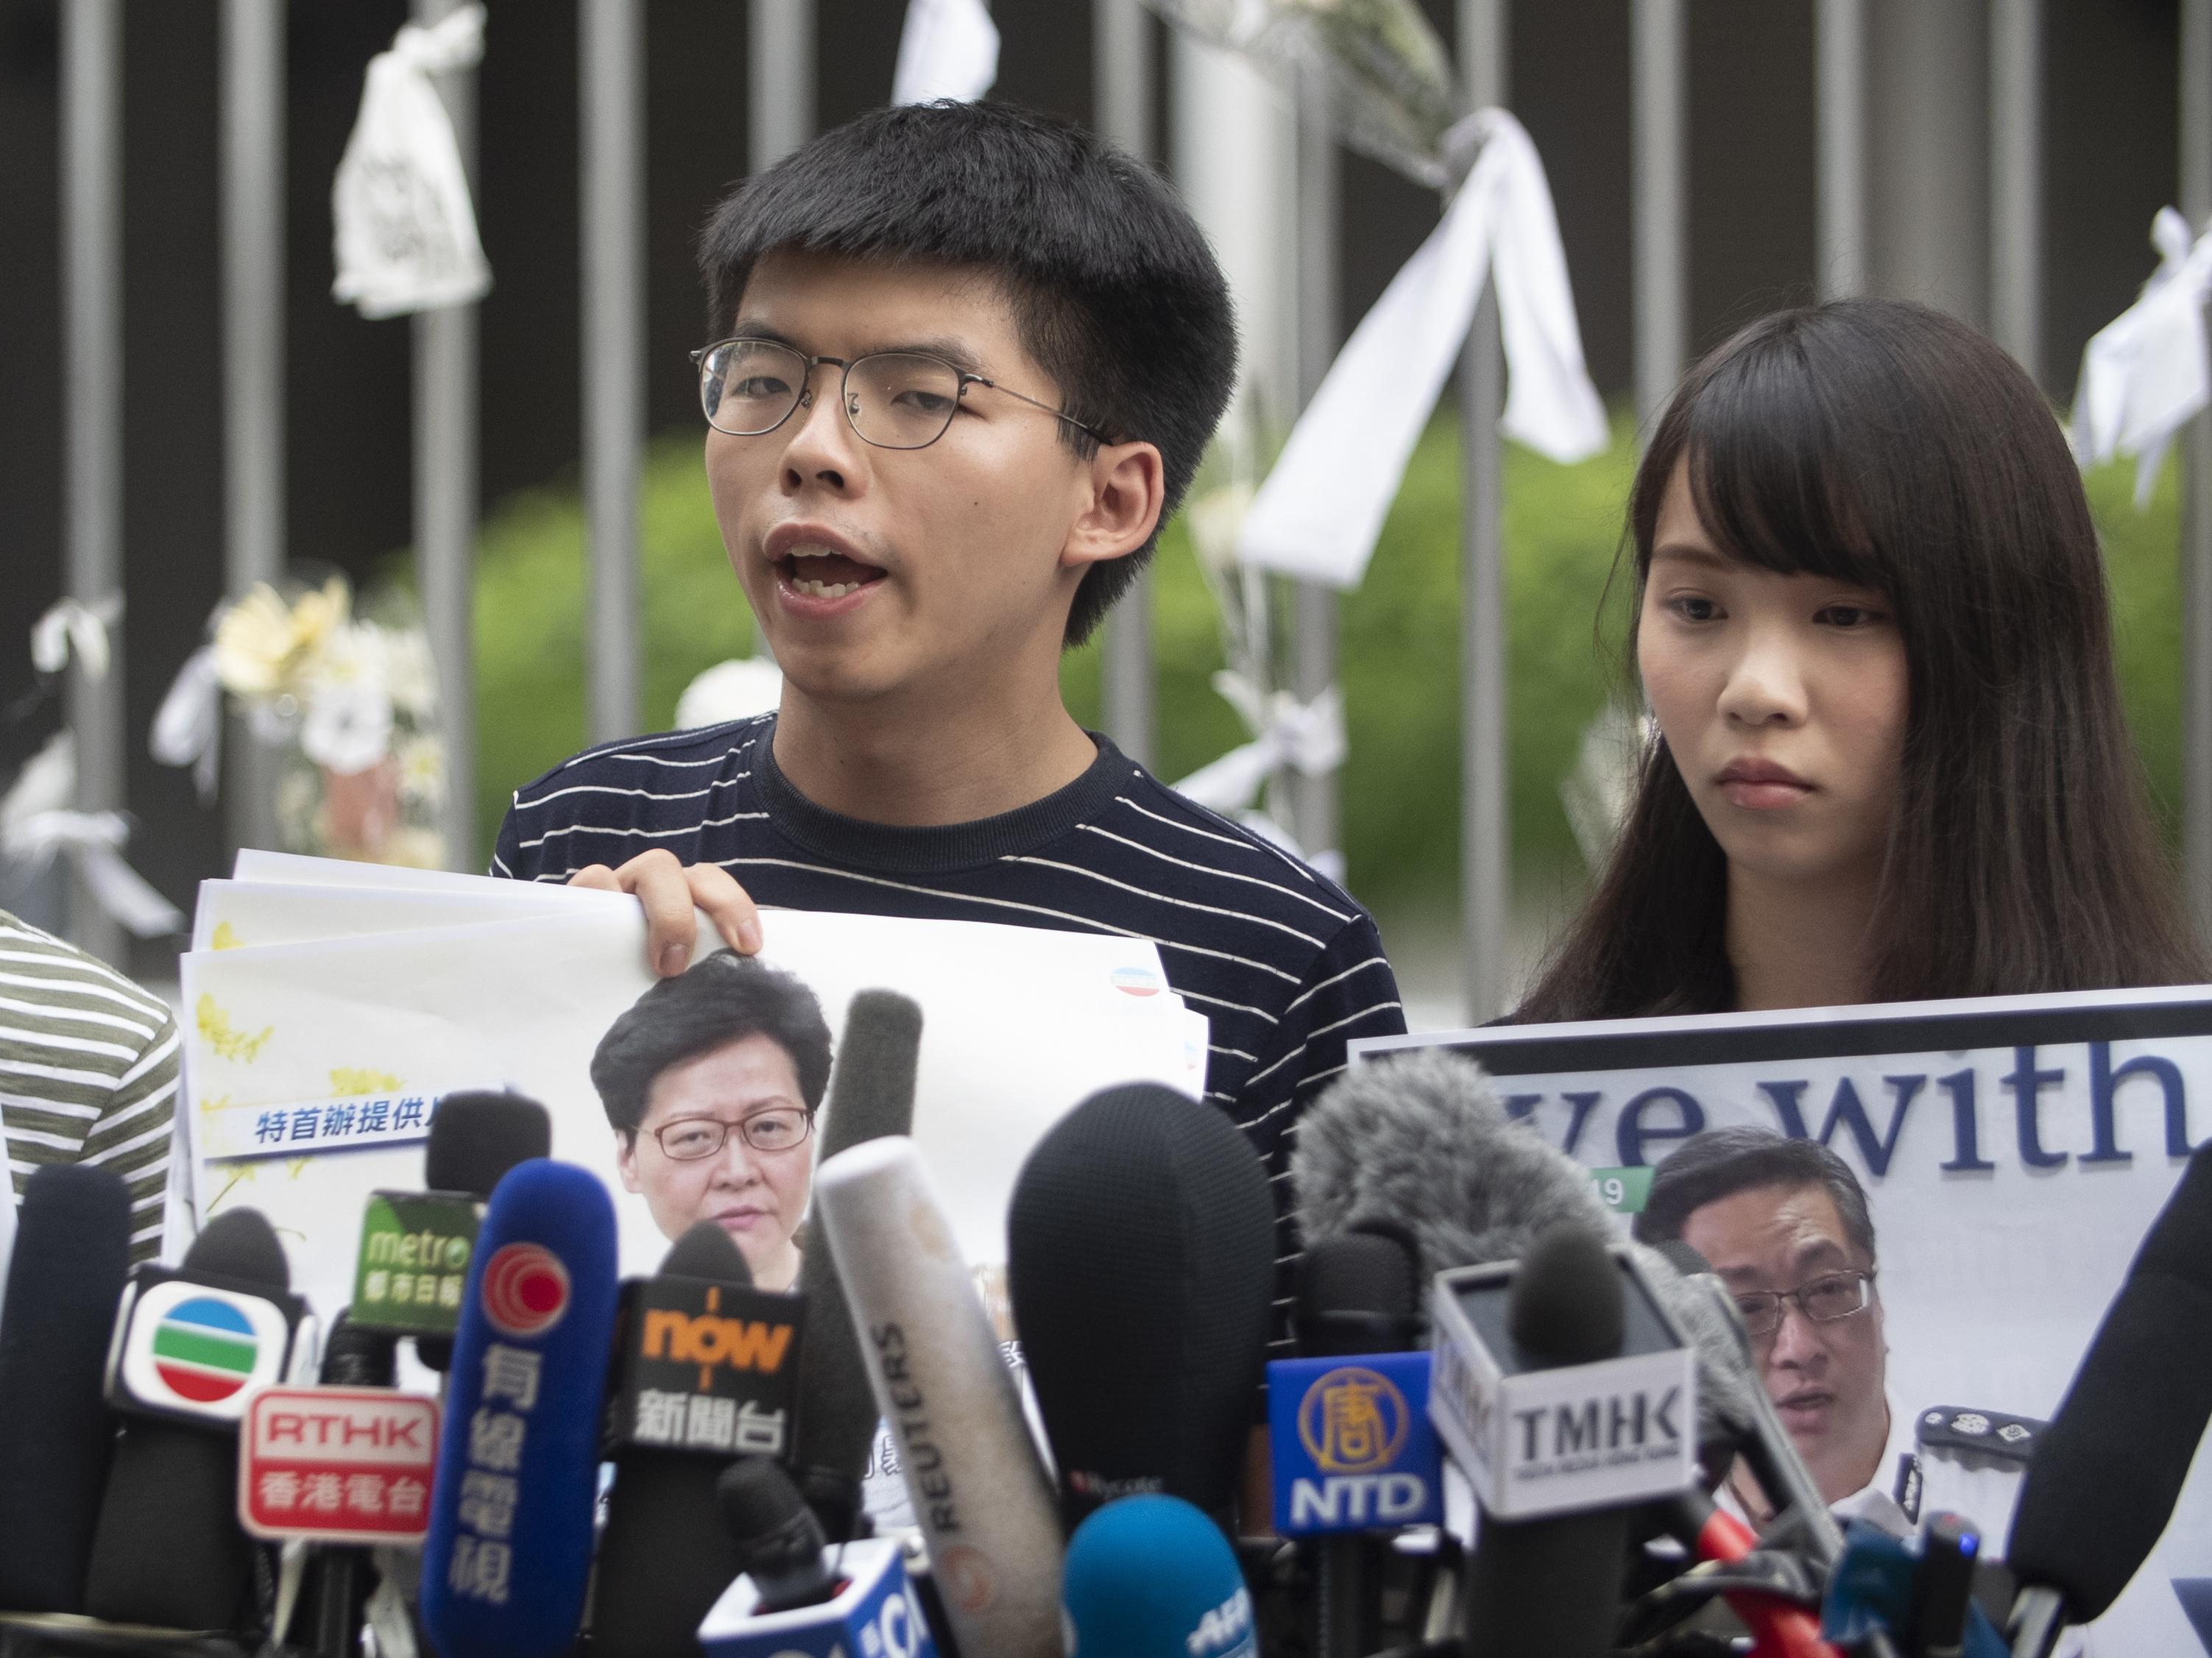 Hong Kong Democracy Activist Joshua Wong Granted Bail After Arrest